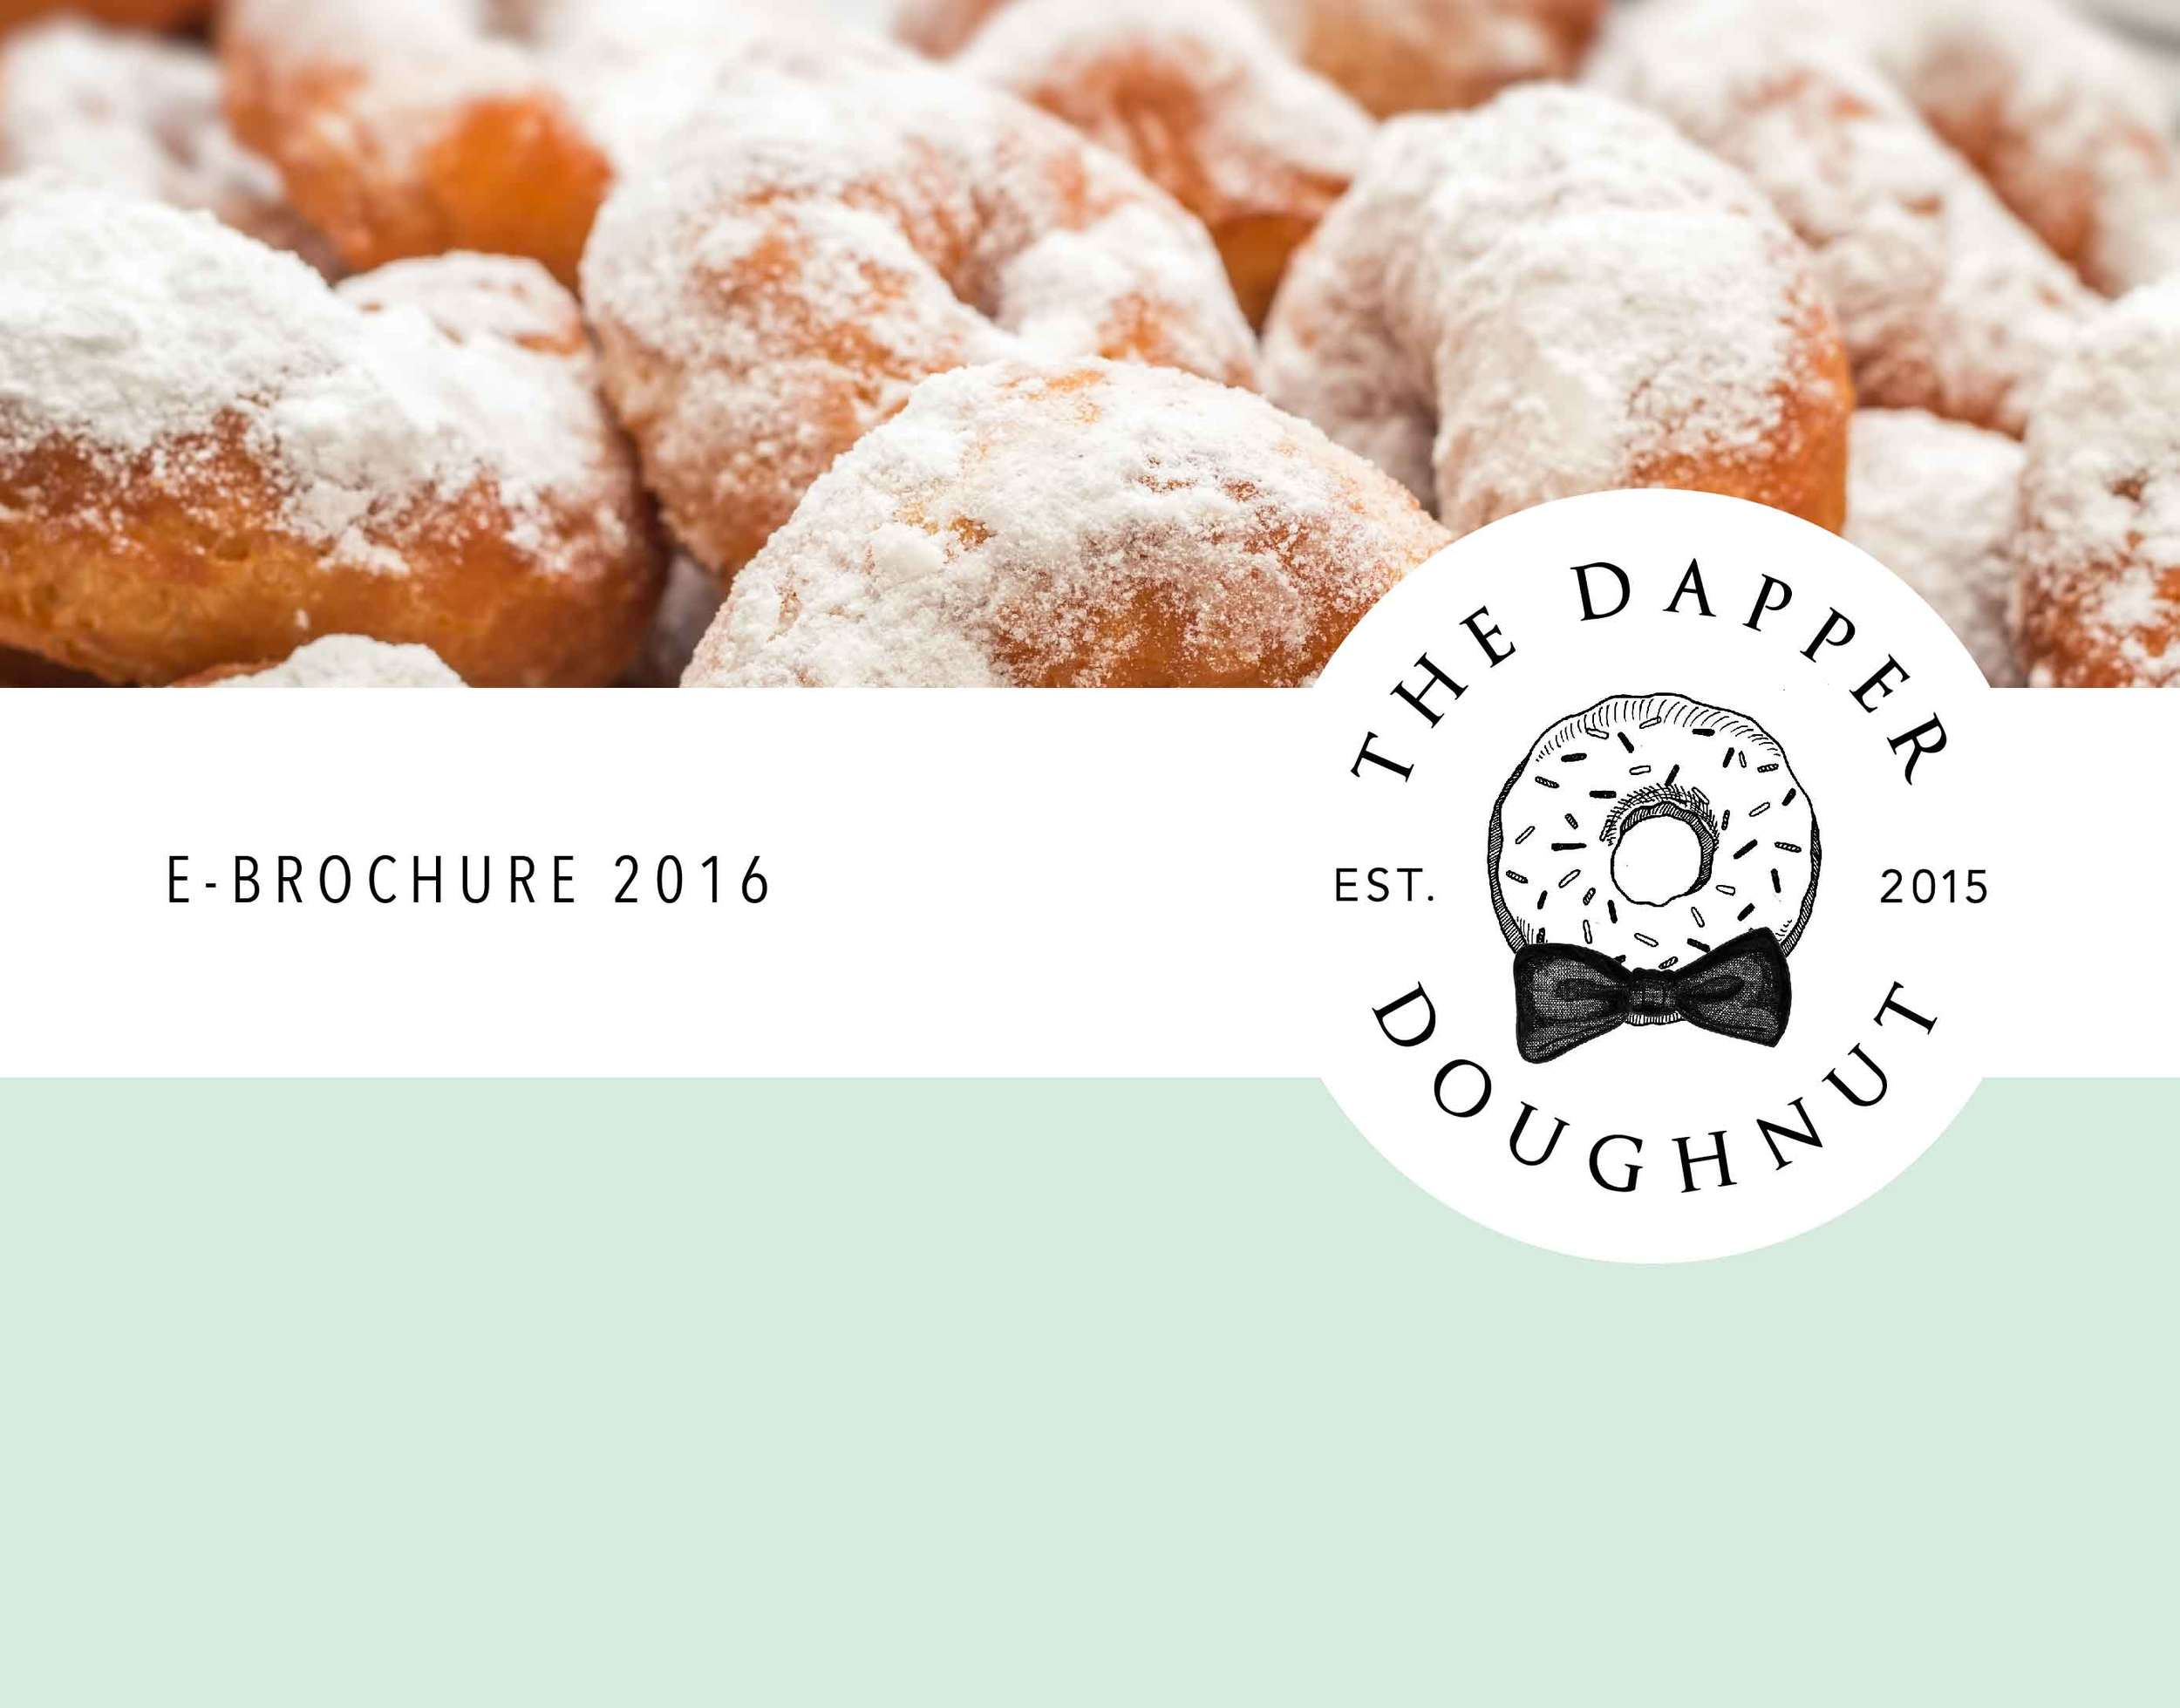 Dapper-EBrochure_Title Page.jpg